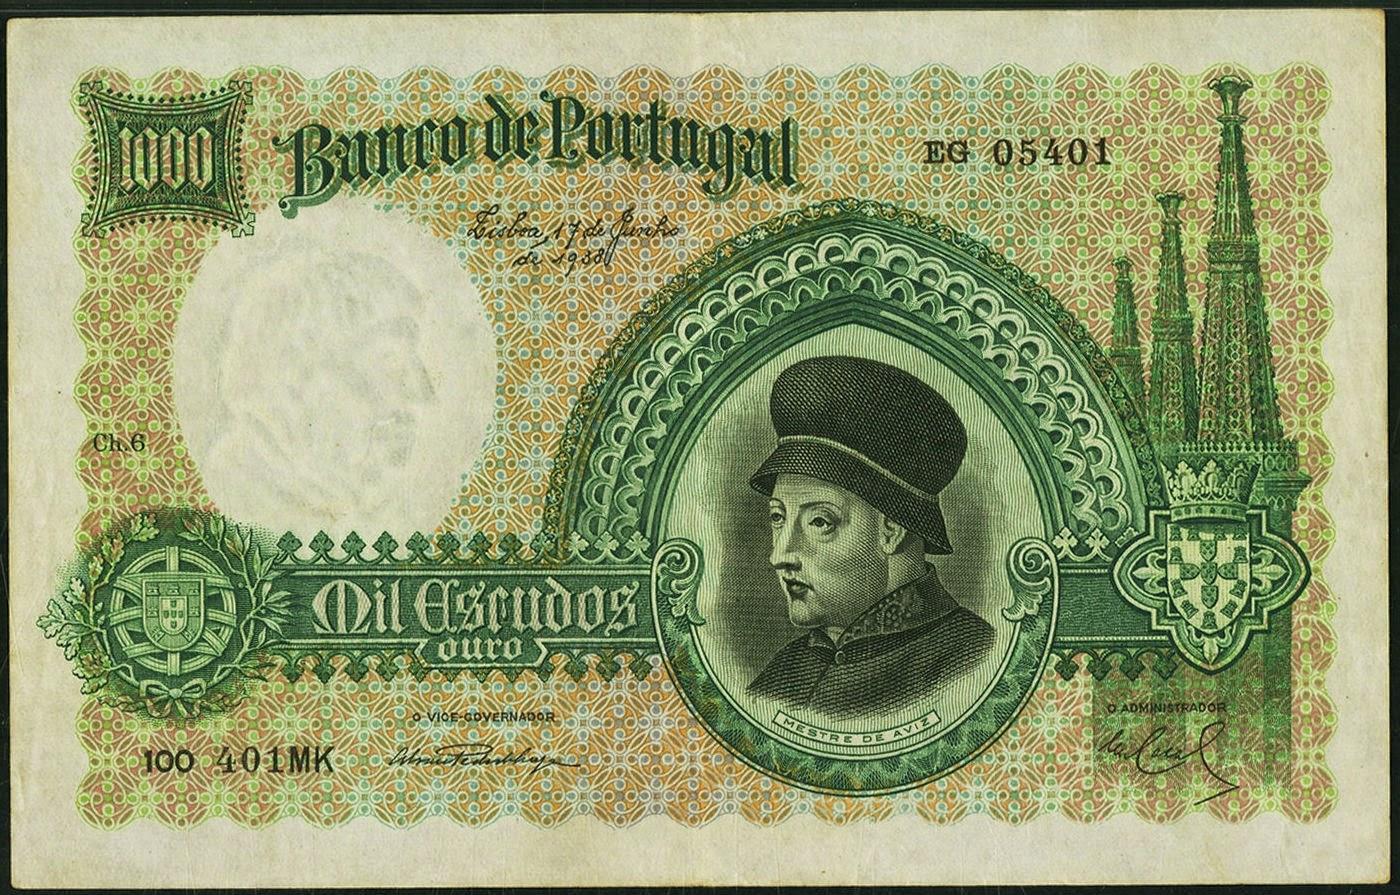 Portugal banknotes 1000 Escudos bank note 1938 King John D. João I